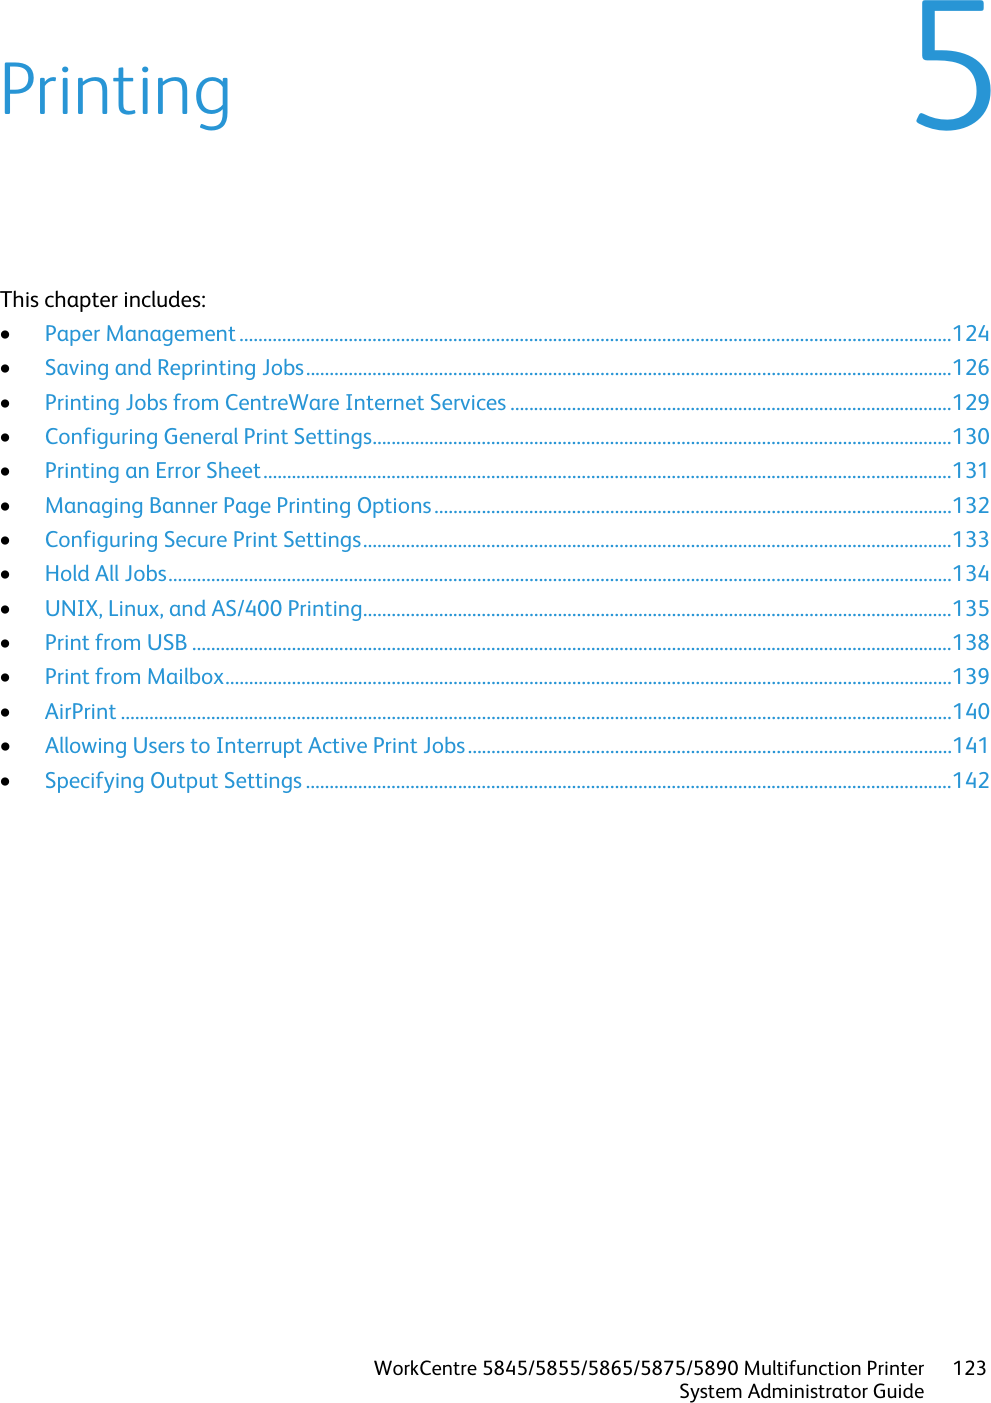 Xerox Workcentre 5845 5855 Administrators Guide 5845/5855